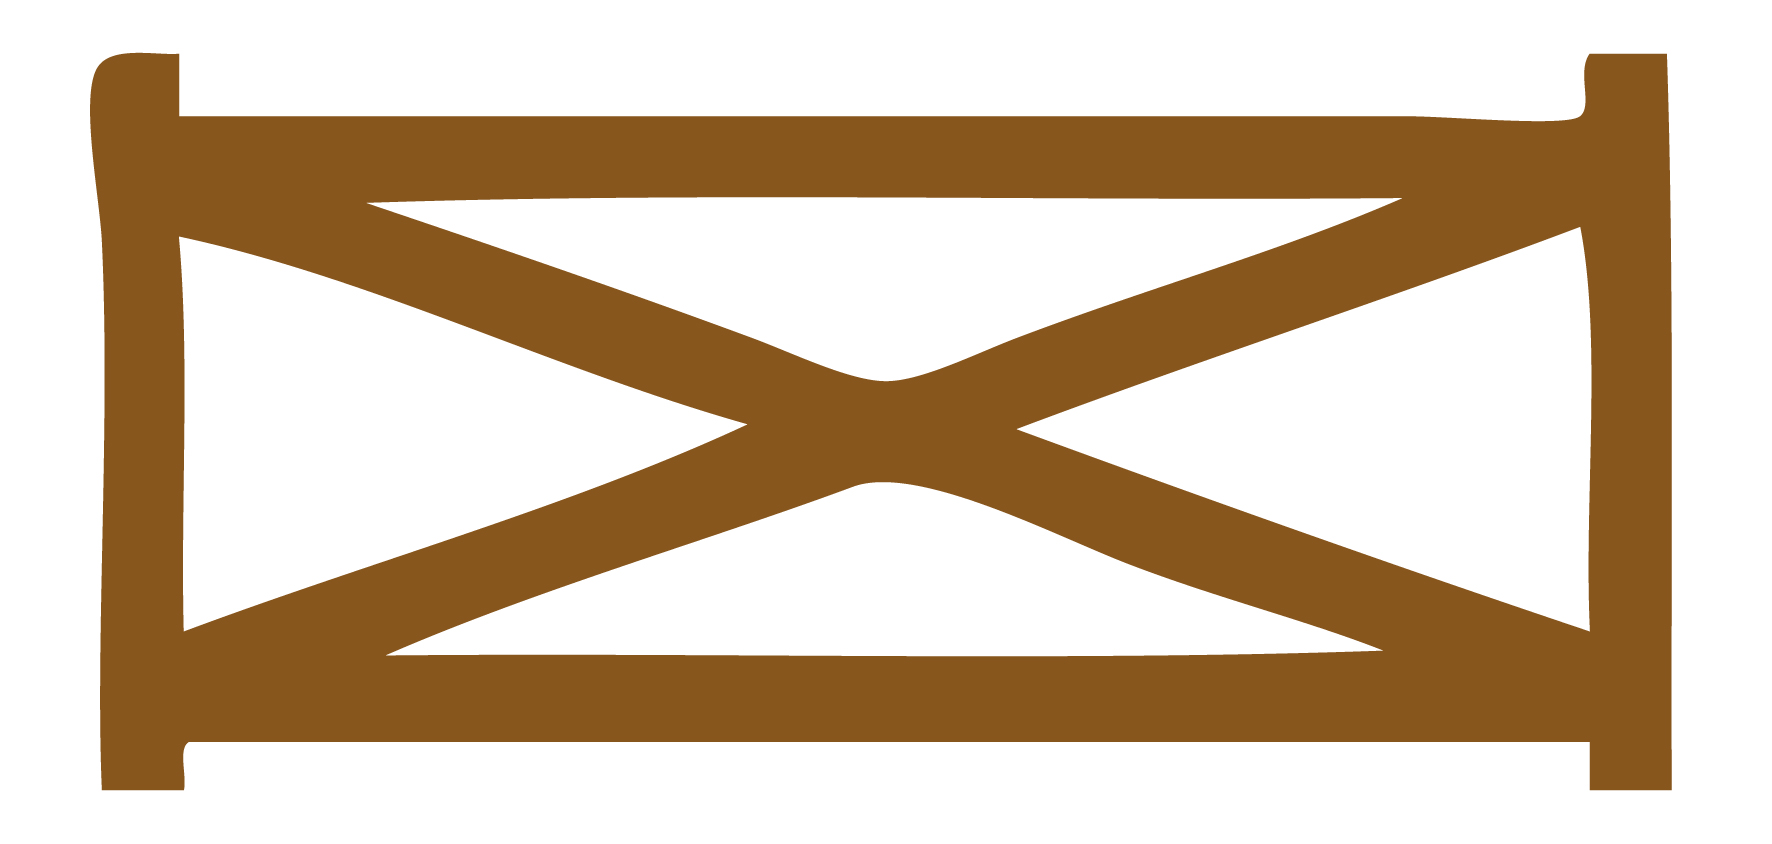 1772x844 Barnyard Fence Clipart